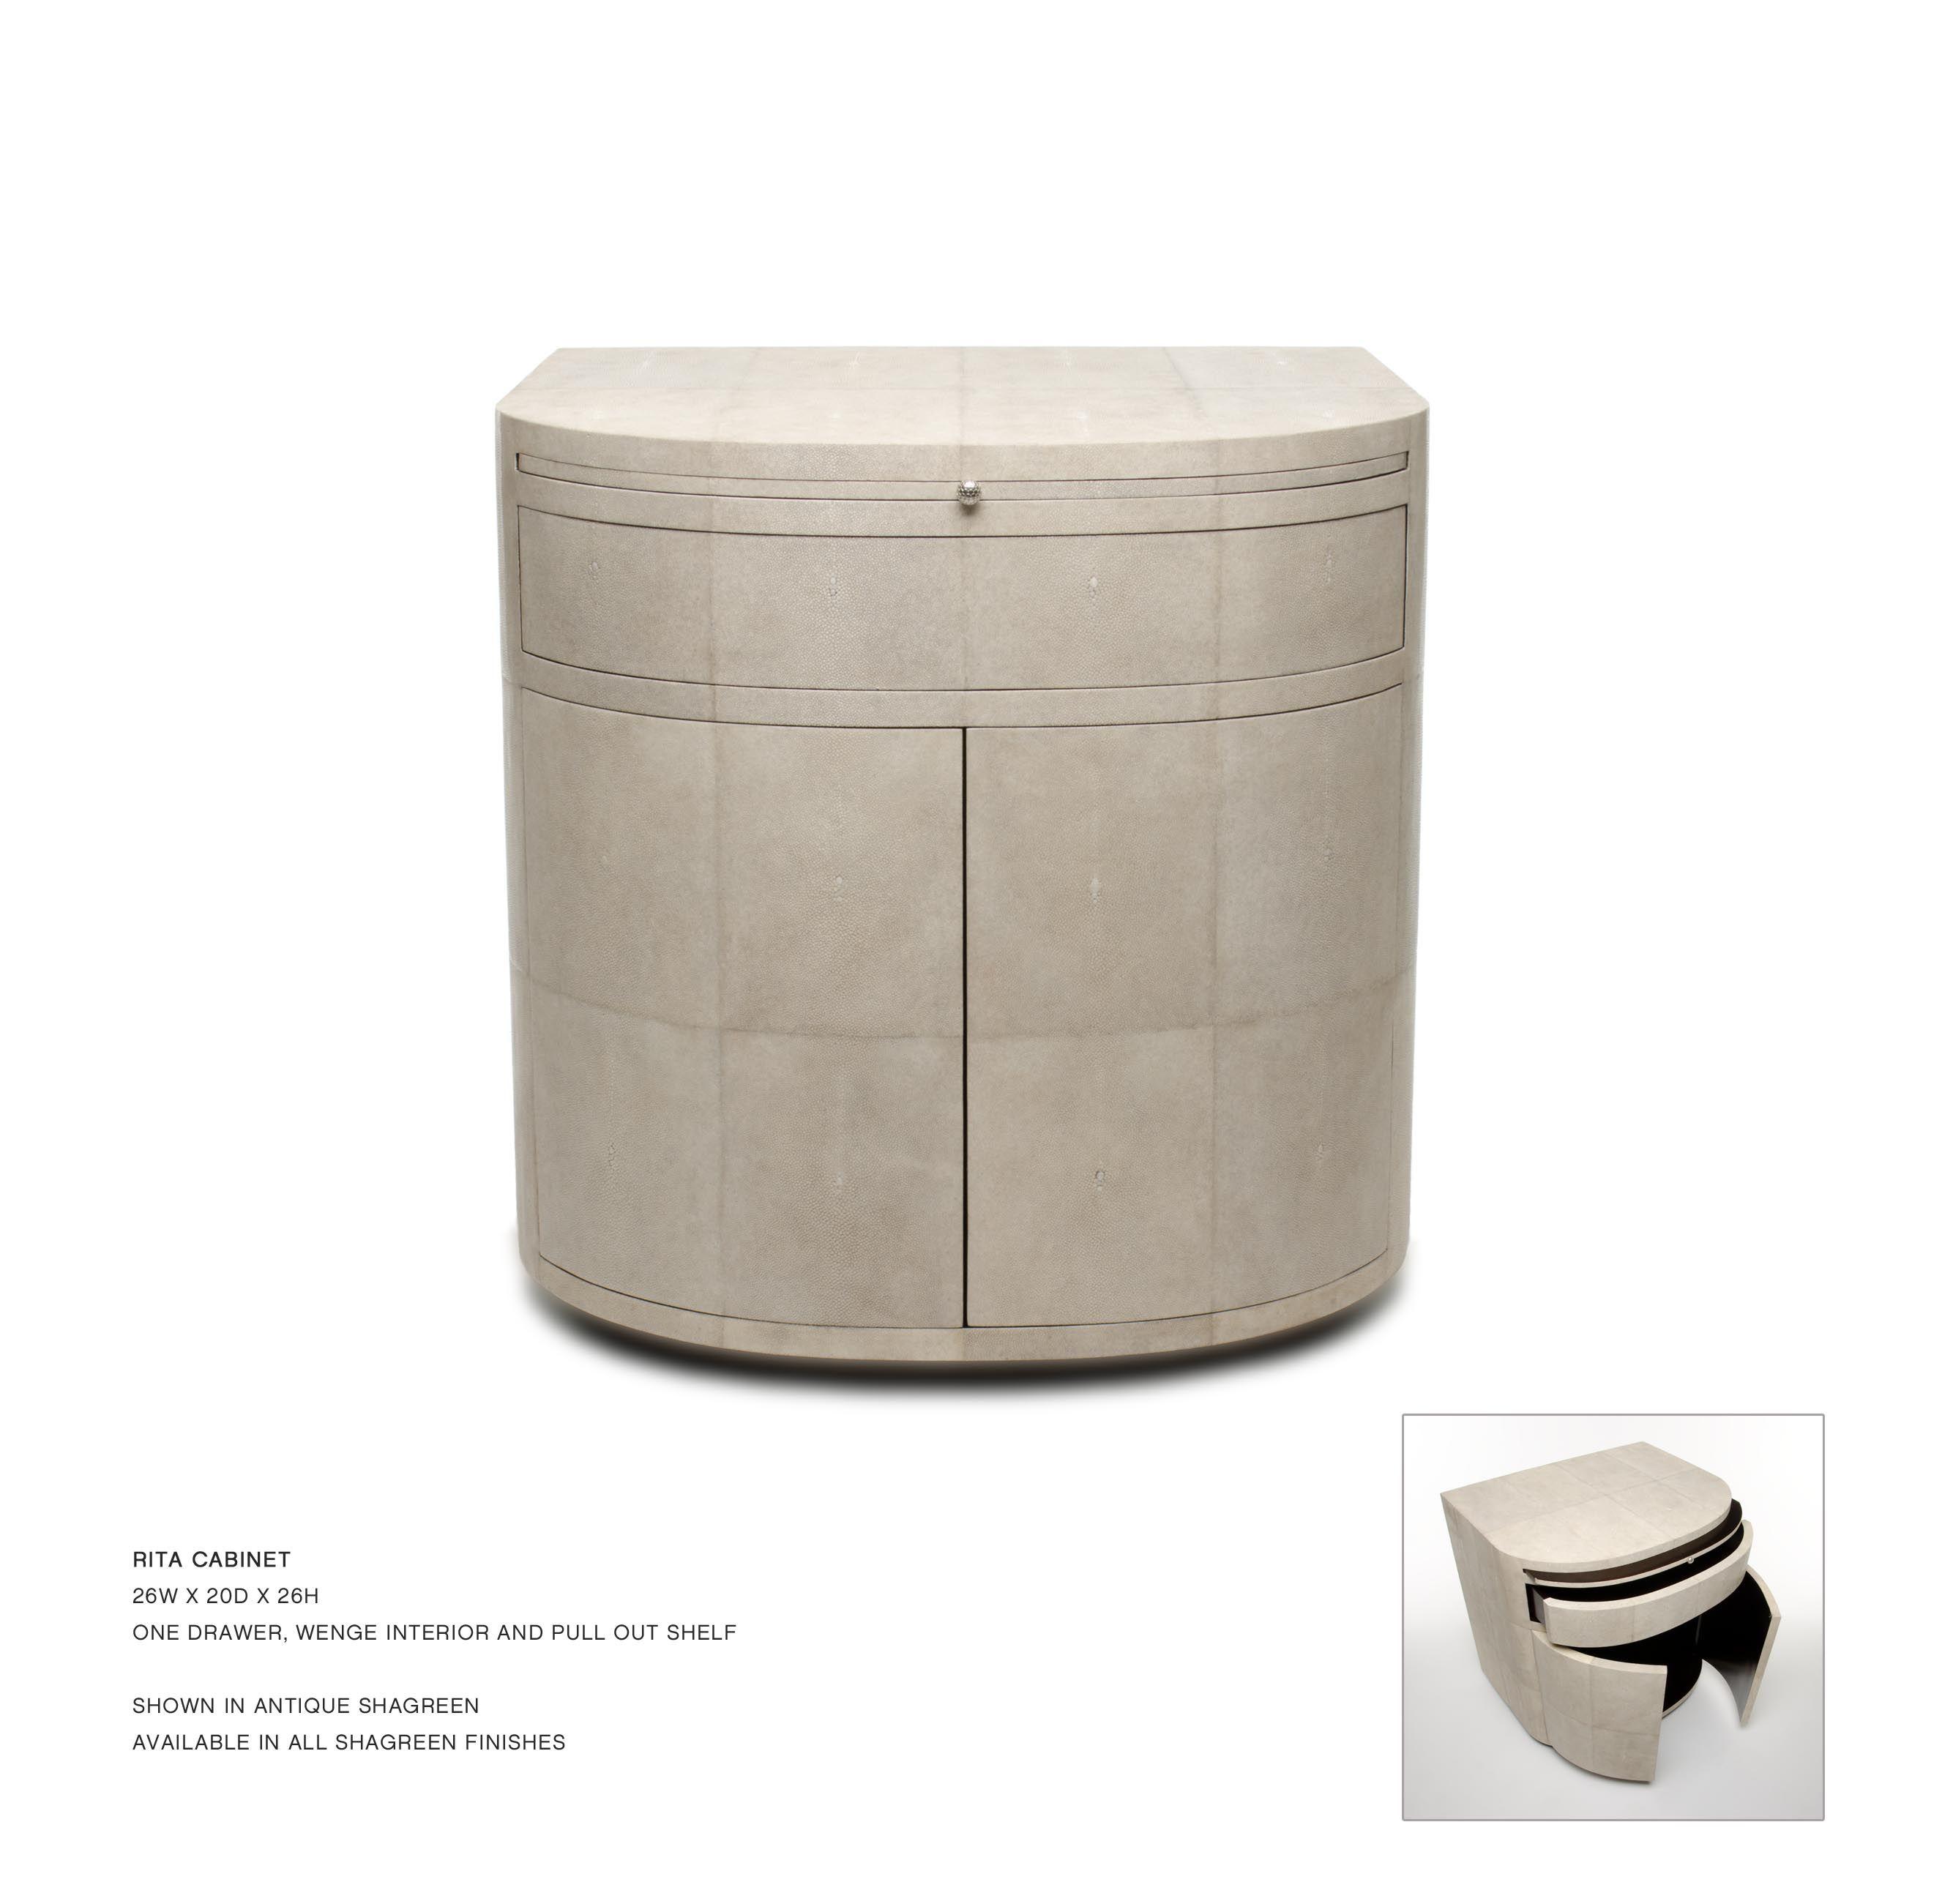 John lyle design rita cabinet the most perfect bedside for Ever design furniture